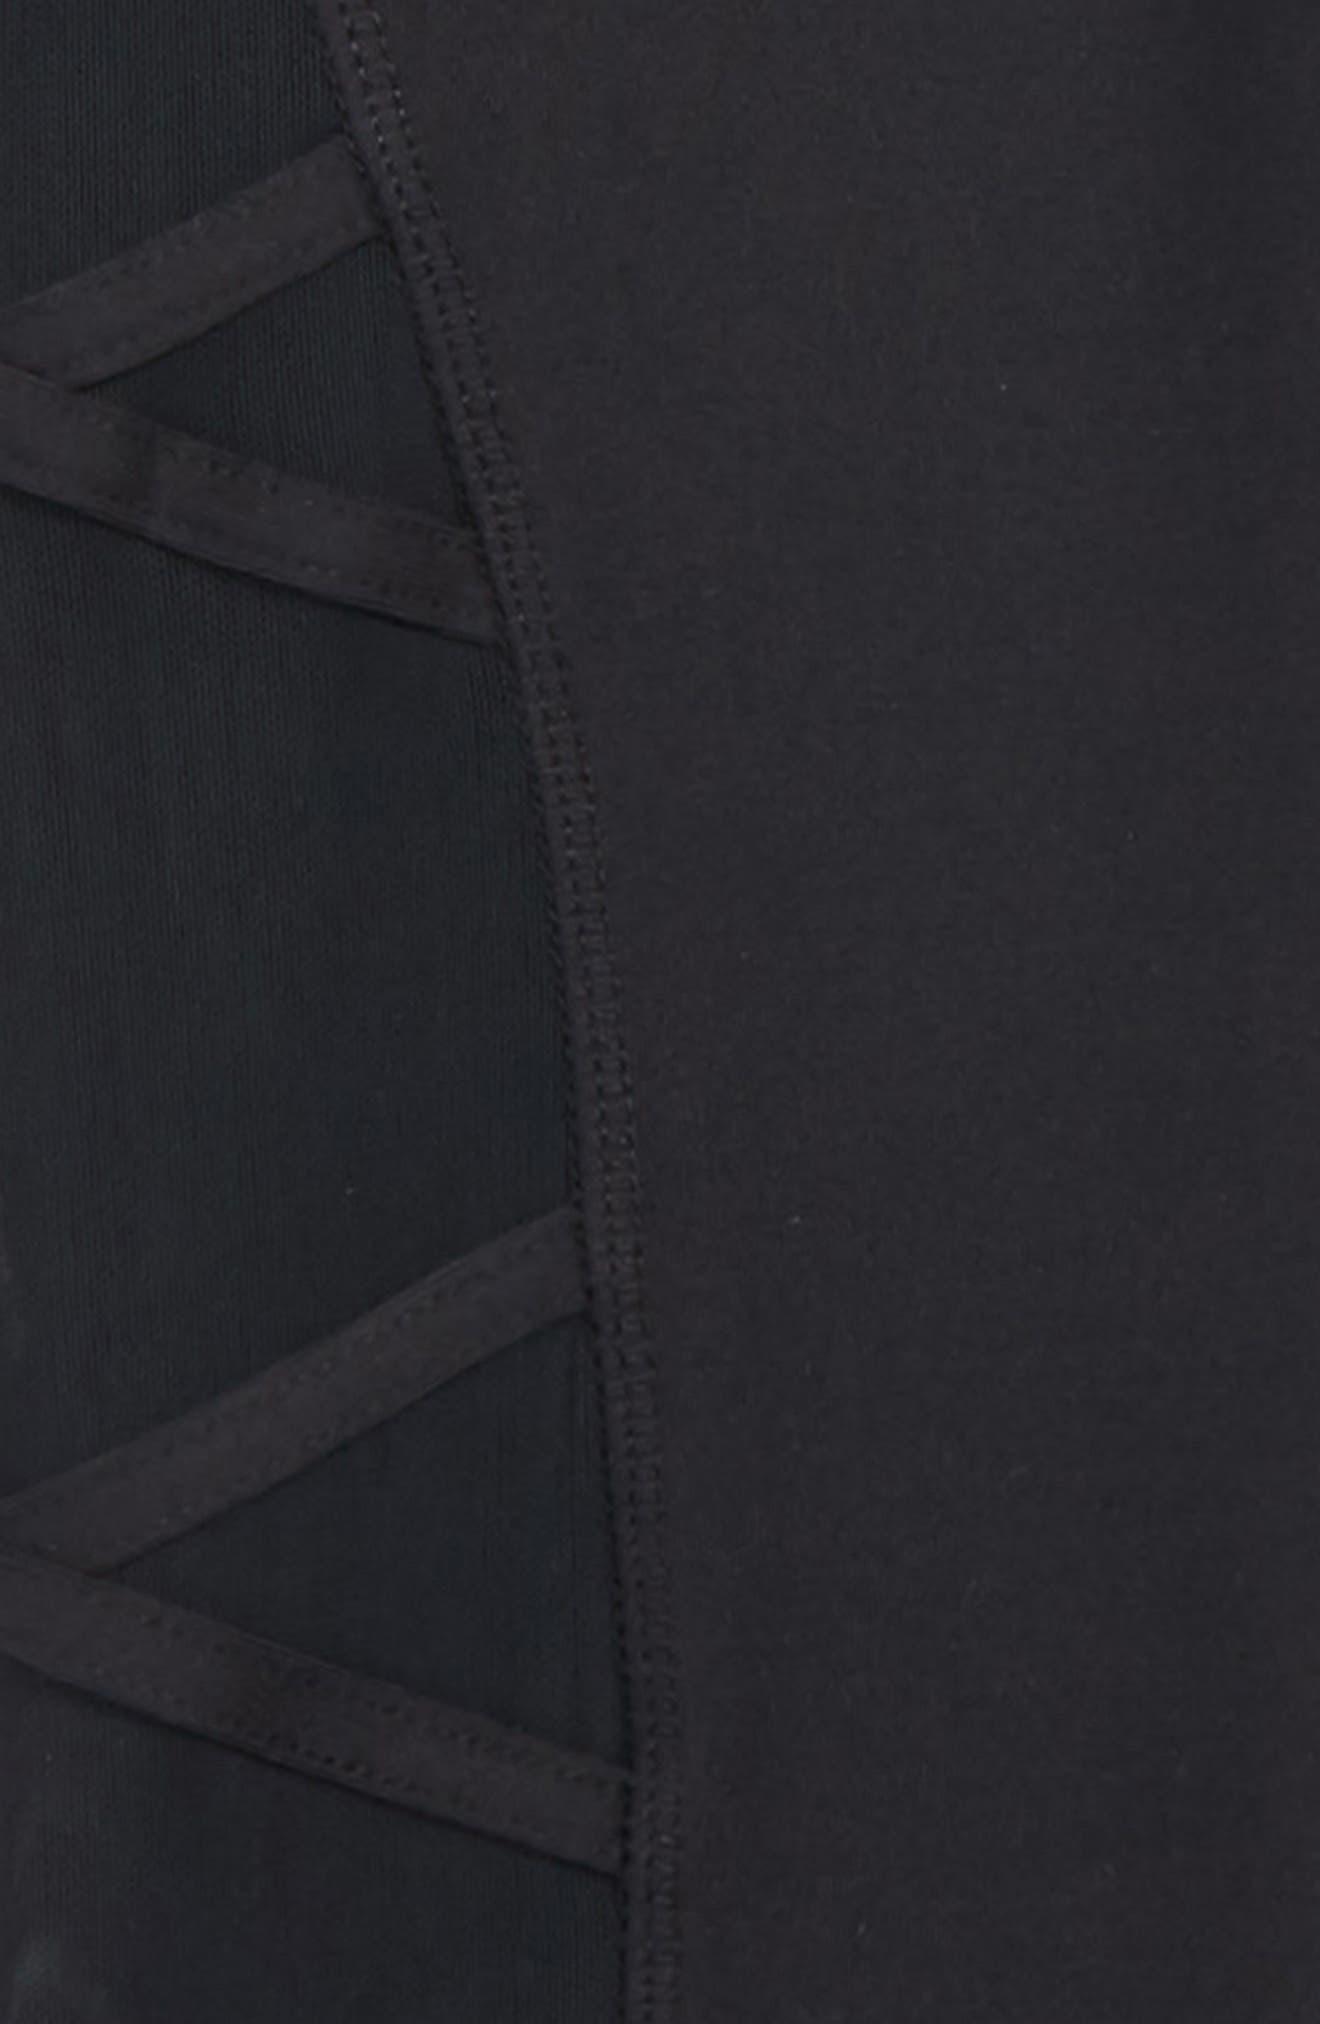 Mesh Crisscross Crop Leggings,                             Alternate thumbnail 2, color,                             Black